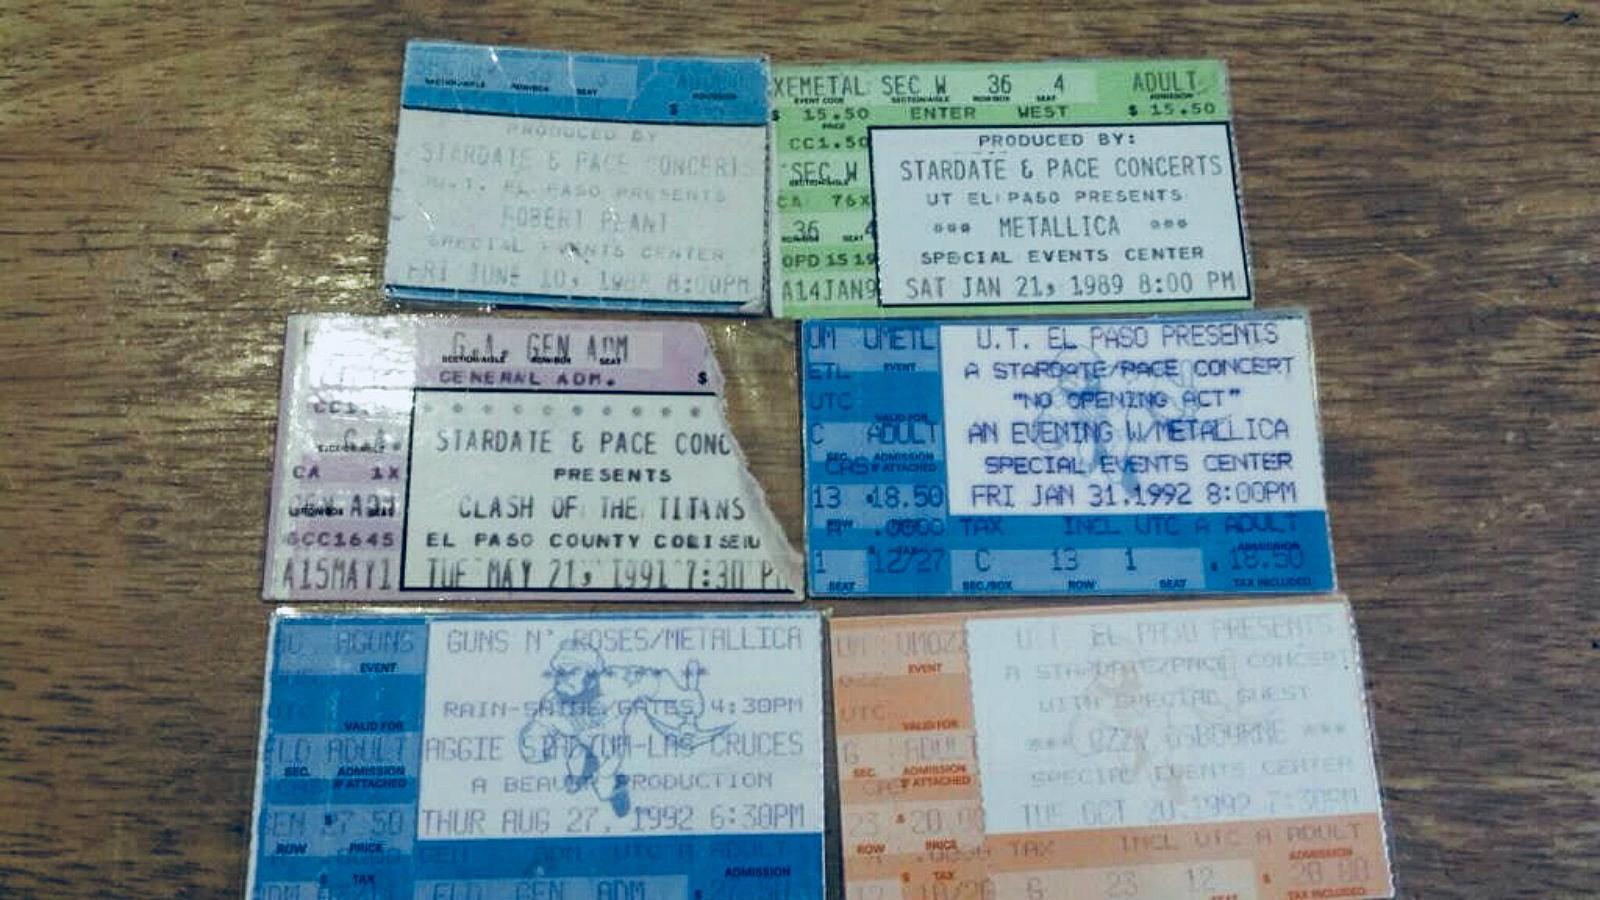 An Open Letter To El Paso Metallica Fans